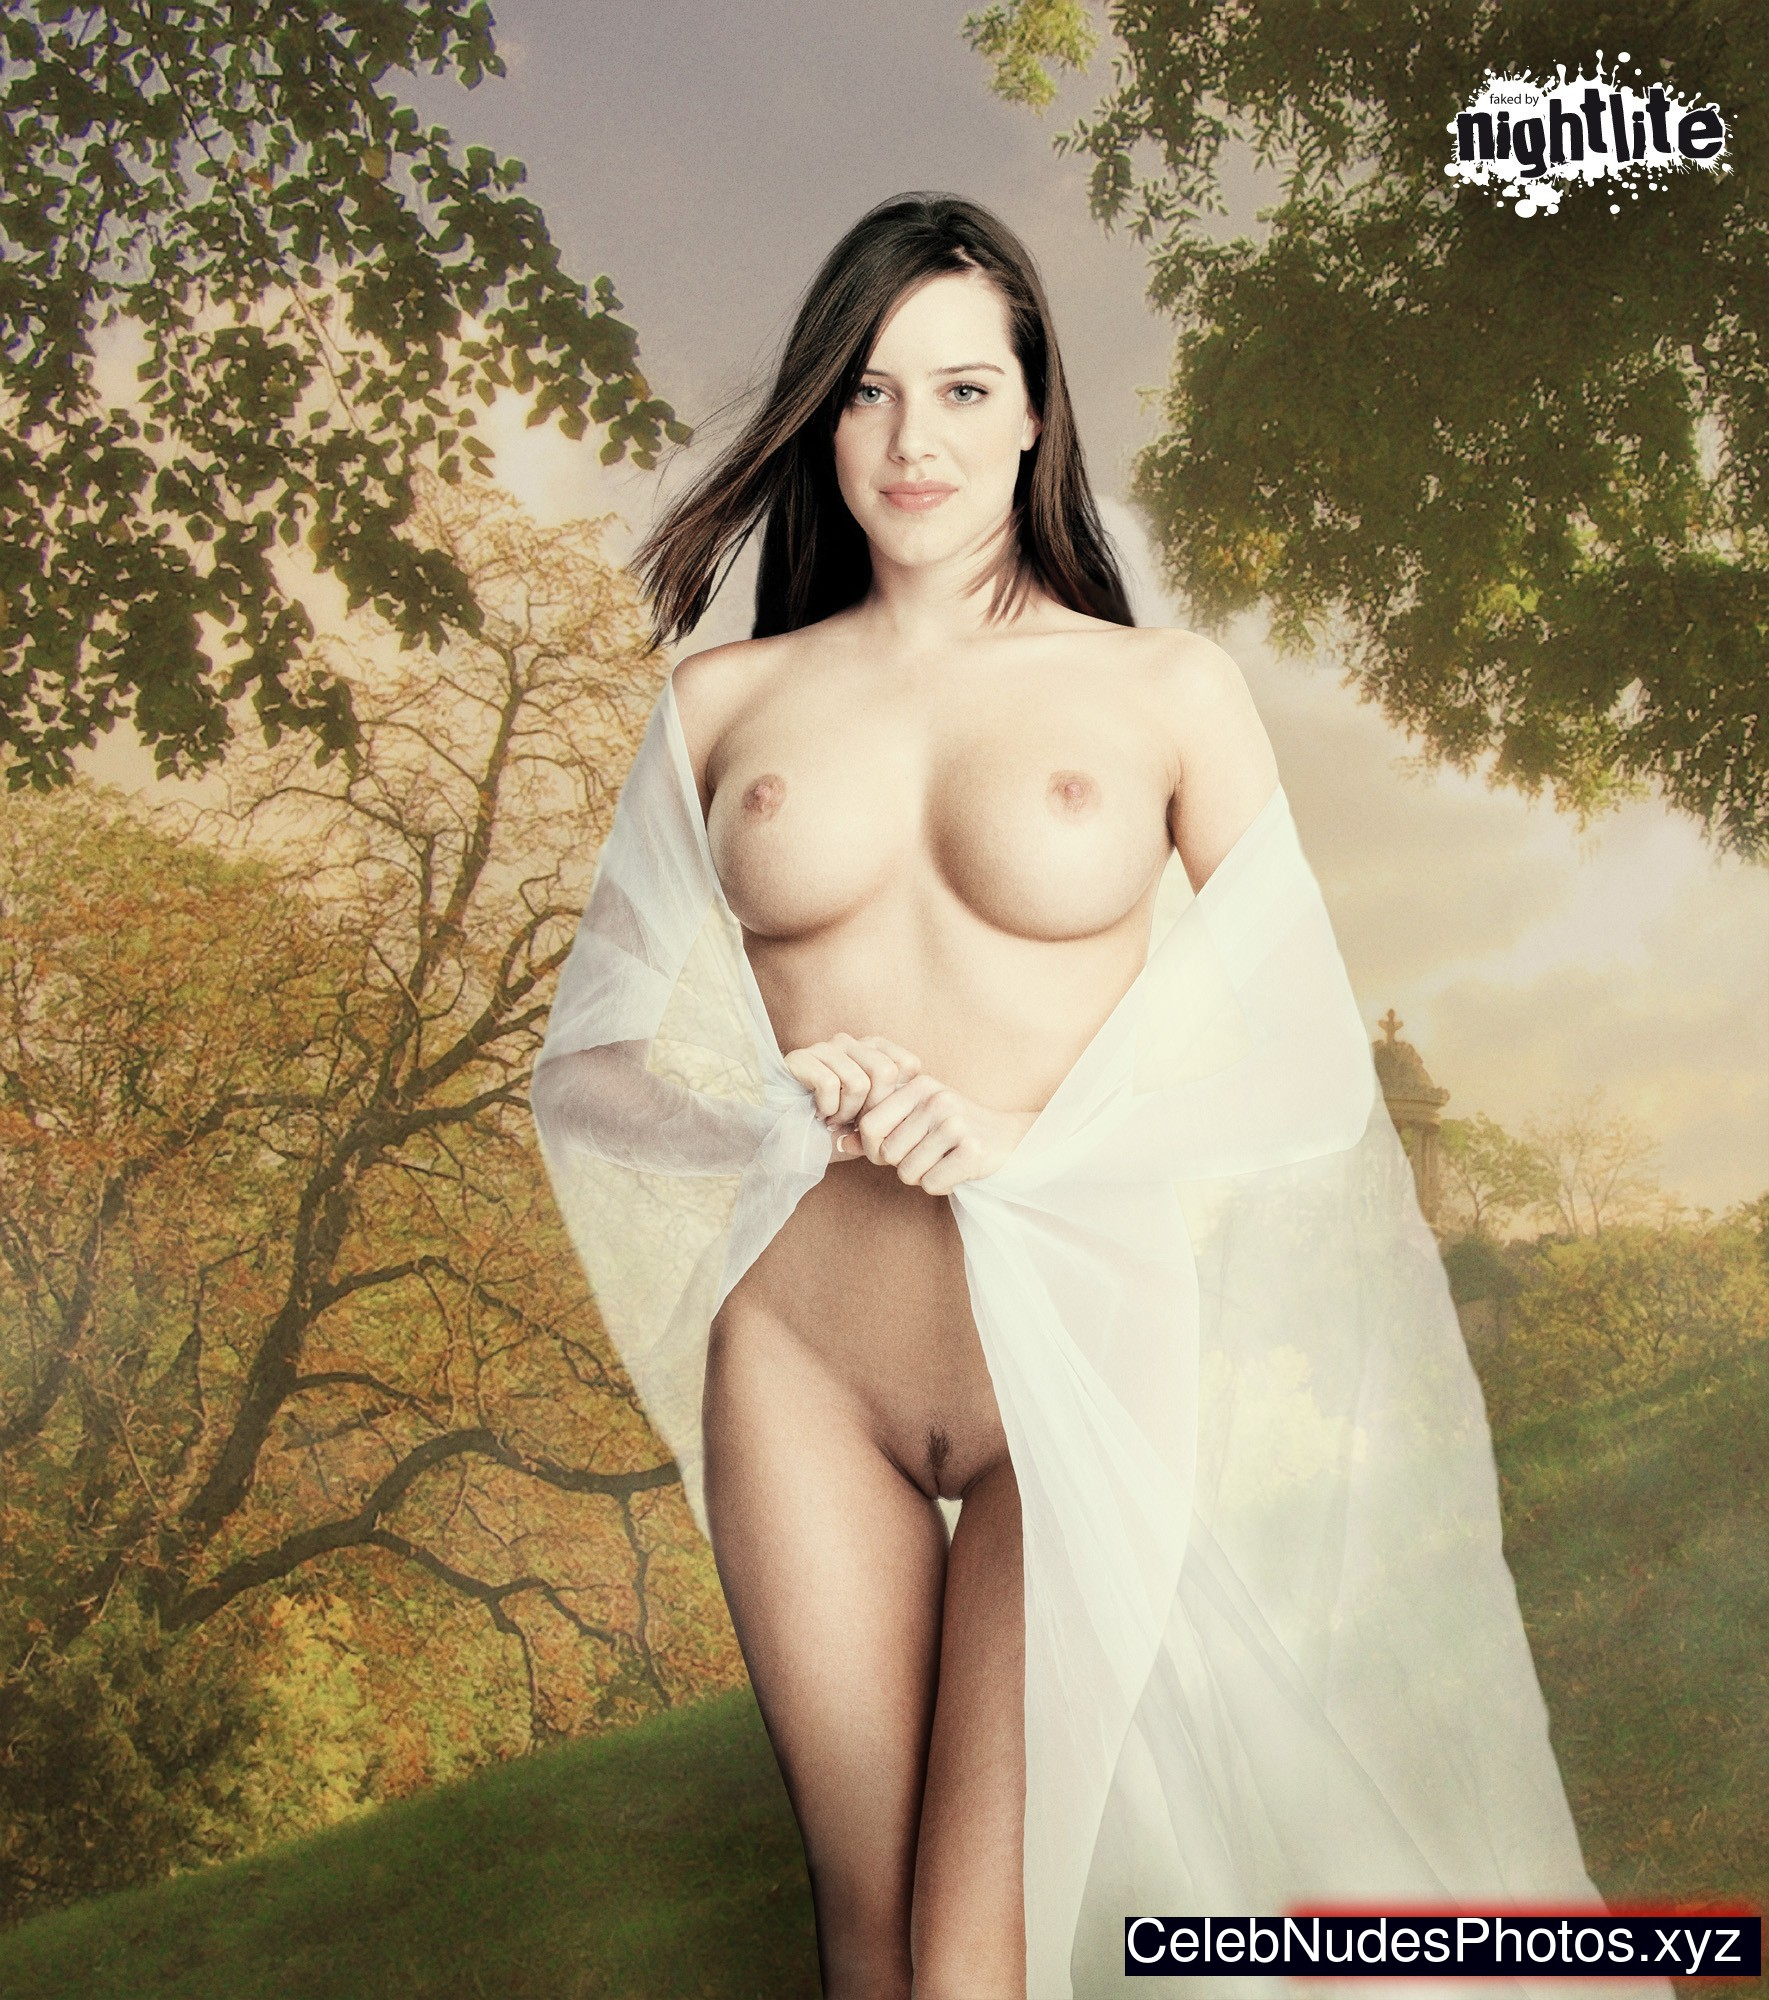 Michelle Ryan Porn Michelle Ryan Free Nude Celeb Image Hot Michelle Ryan Naked Celebrity